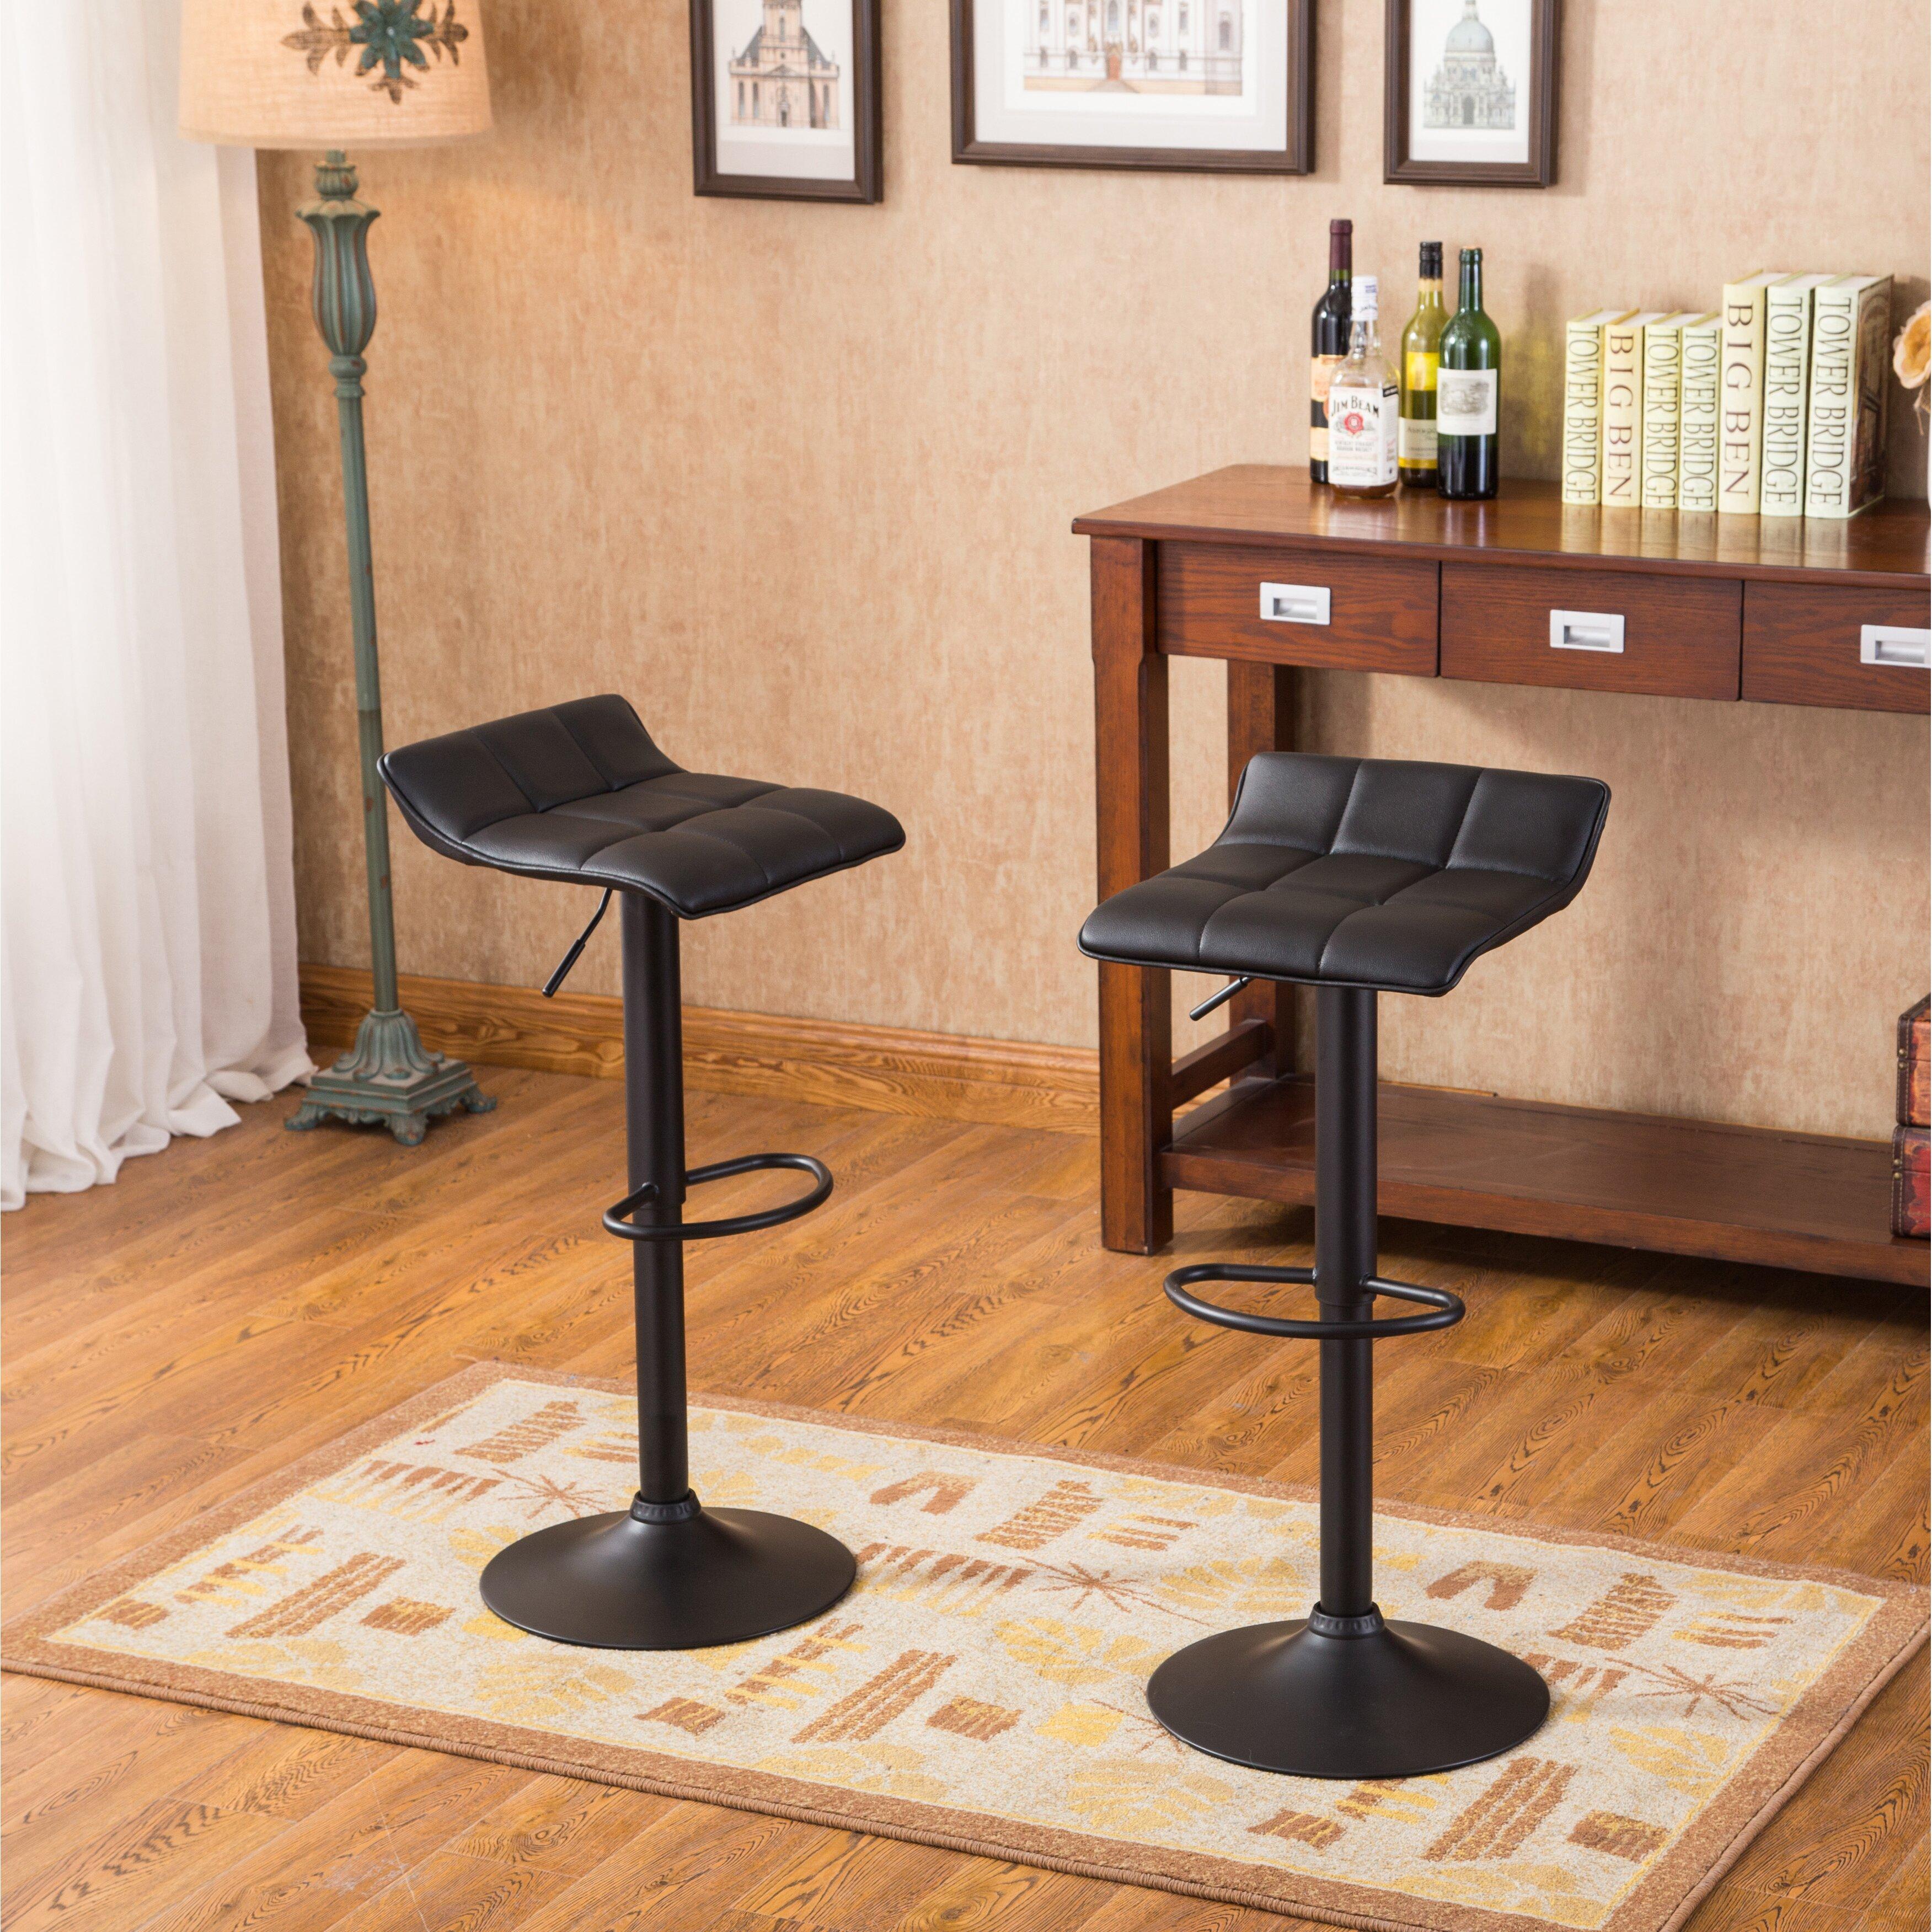 Tremendous Roundhill Furniture Bar Stools 51 Off Roundhill Furniture Theyellowbook Wood Chair Design Ideas Theyellowbookinfo